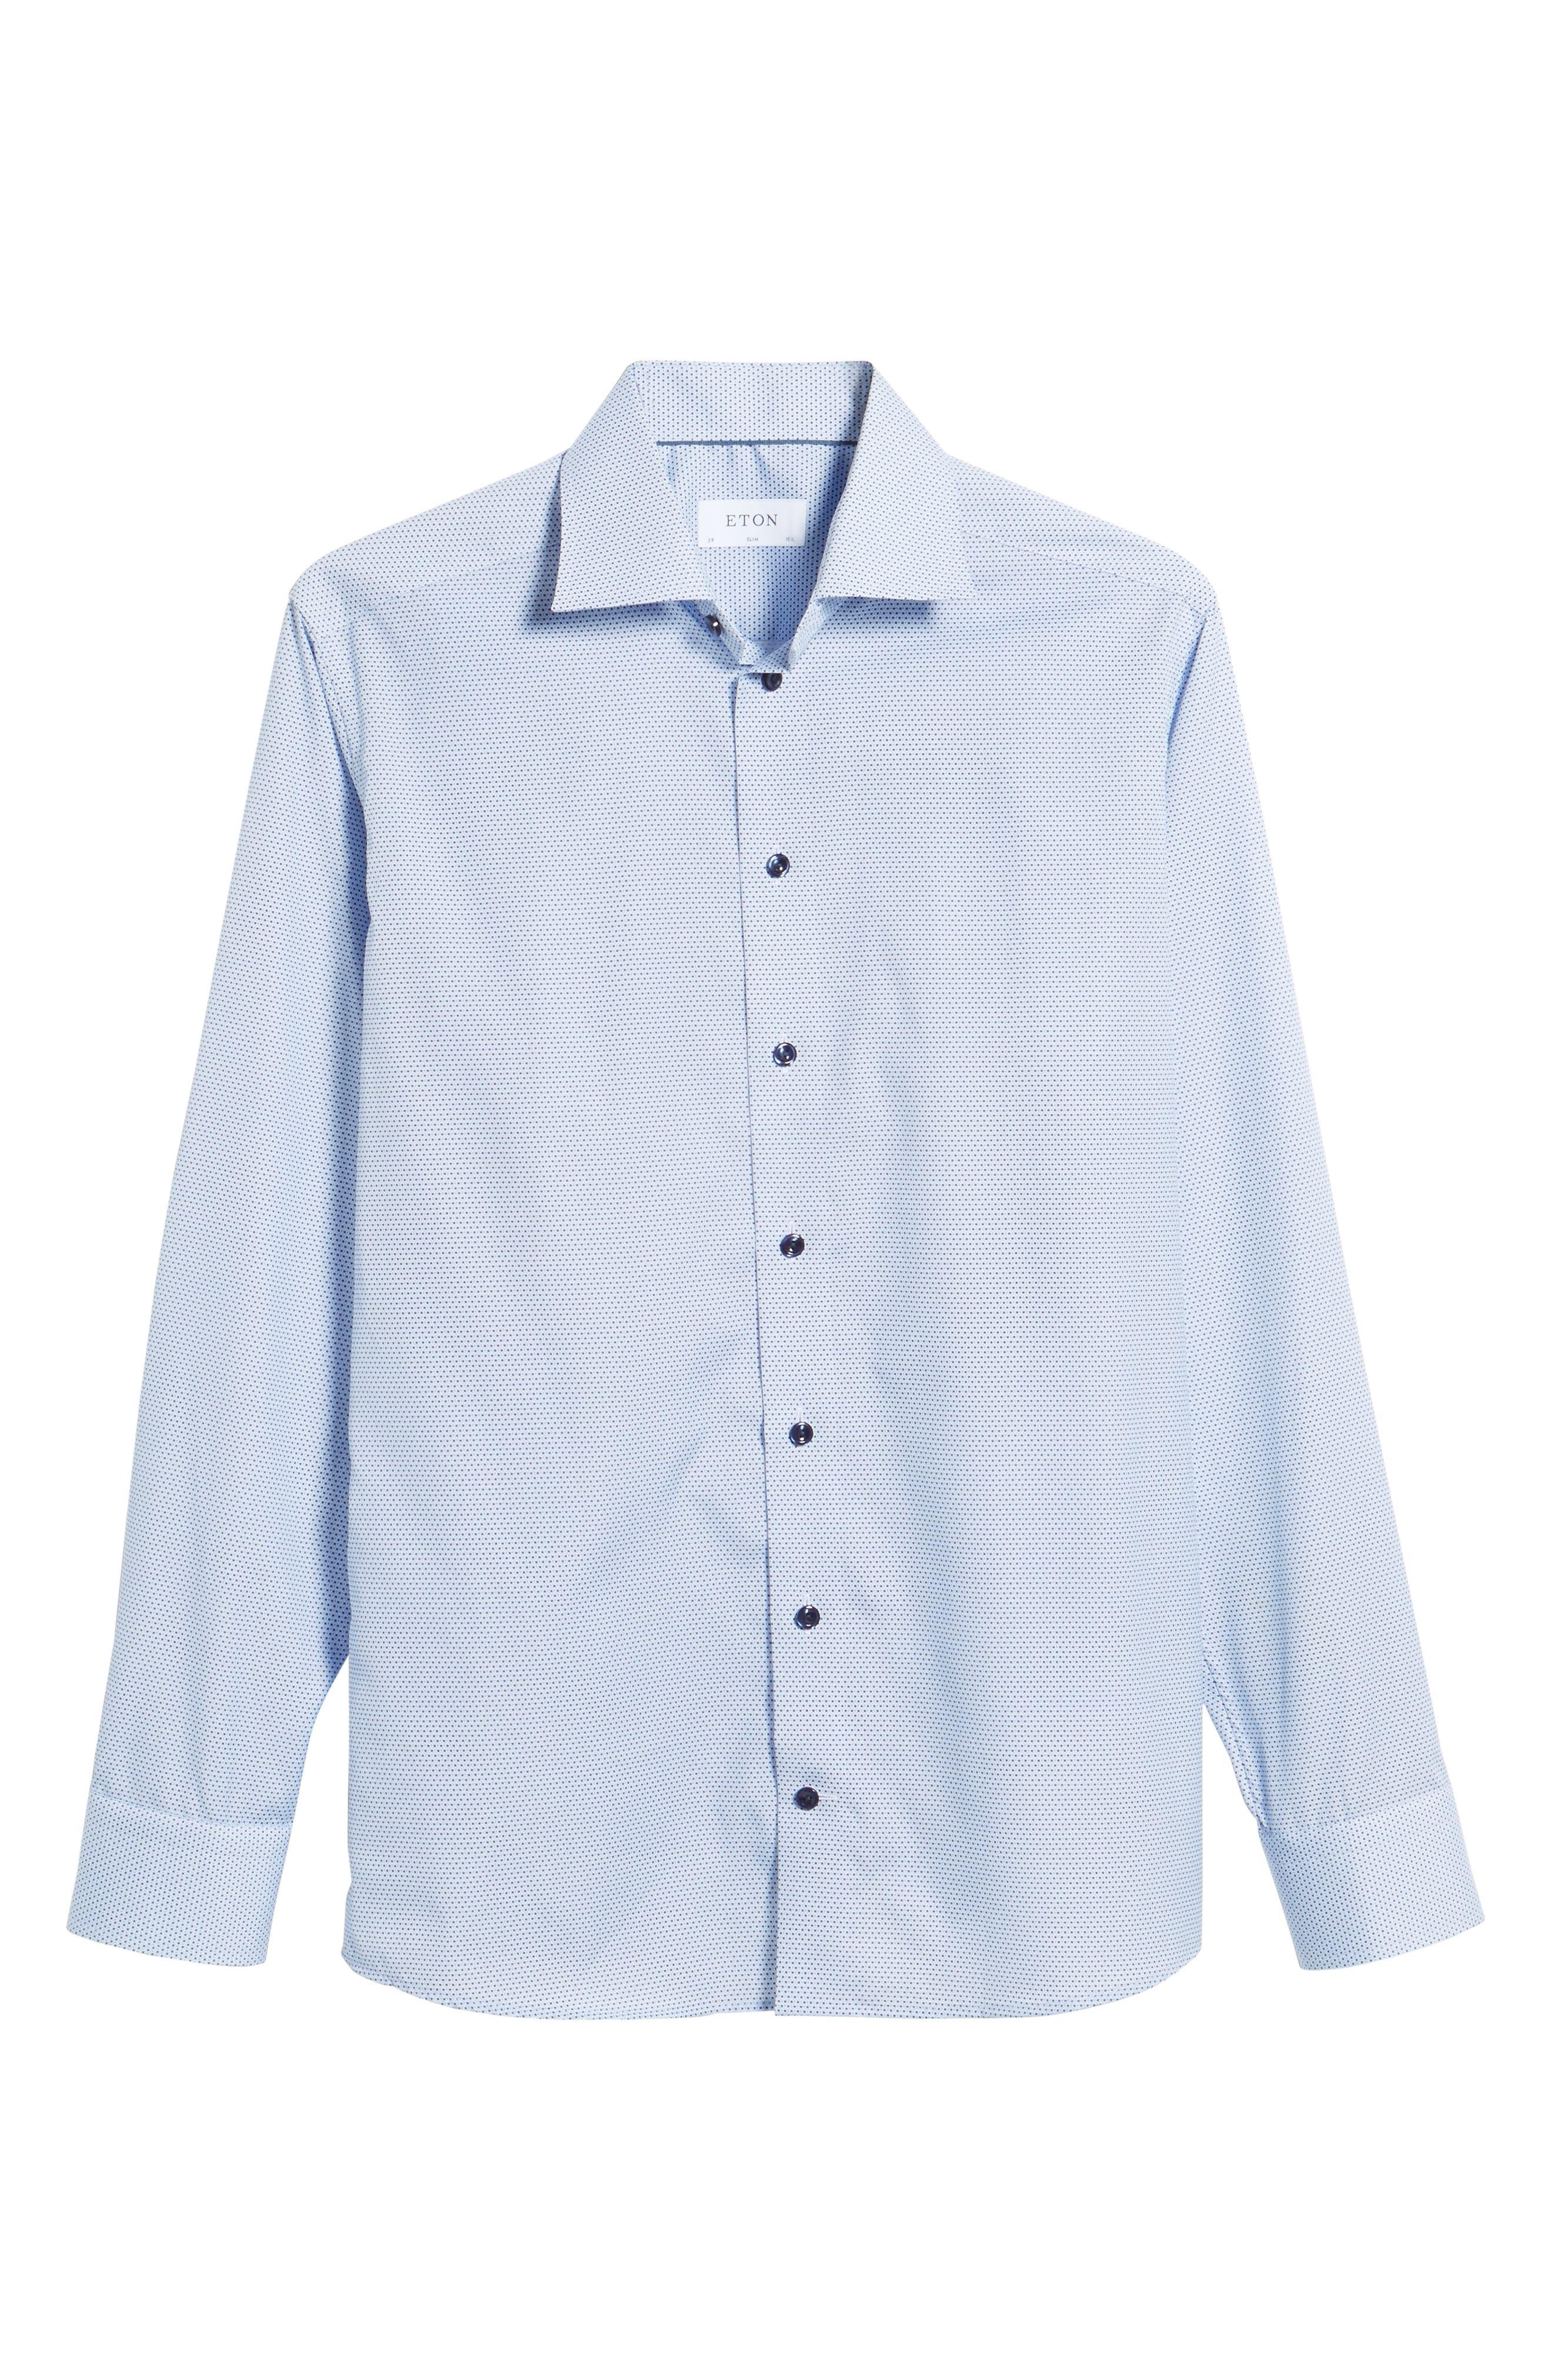 Slim Fit Microprint Dress Shirt,                             Alternate thumbnail 7, color,                             Blue